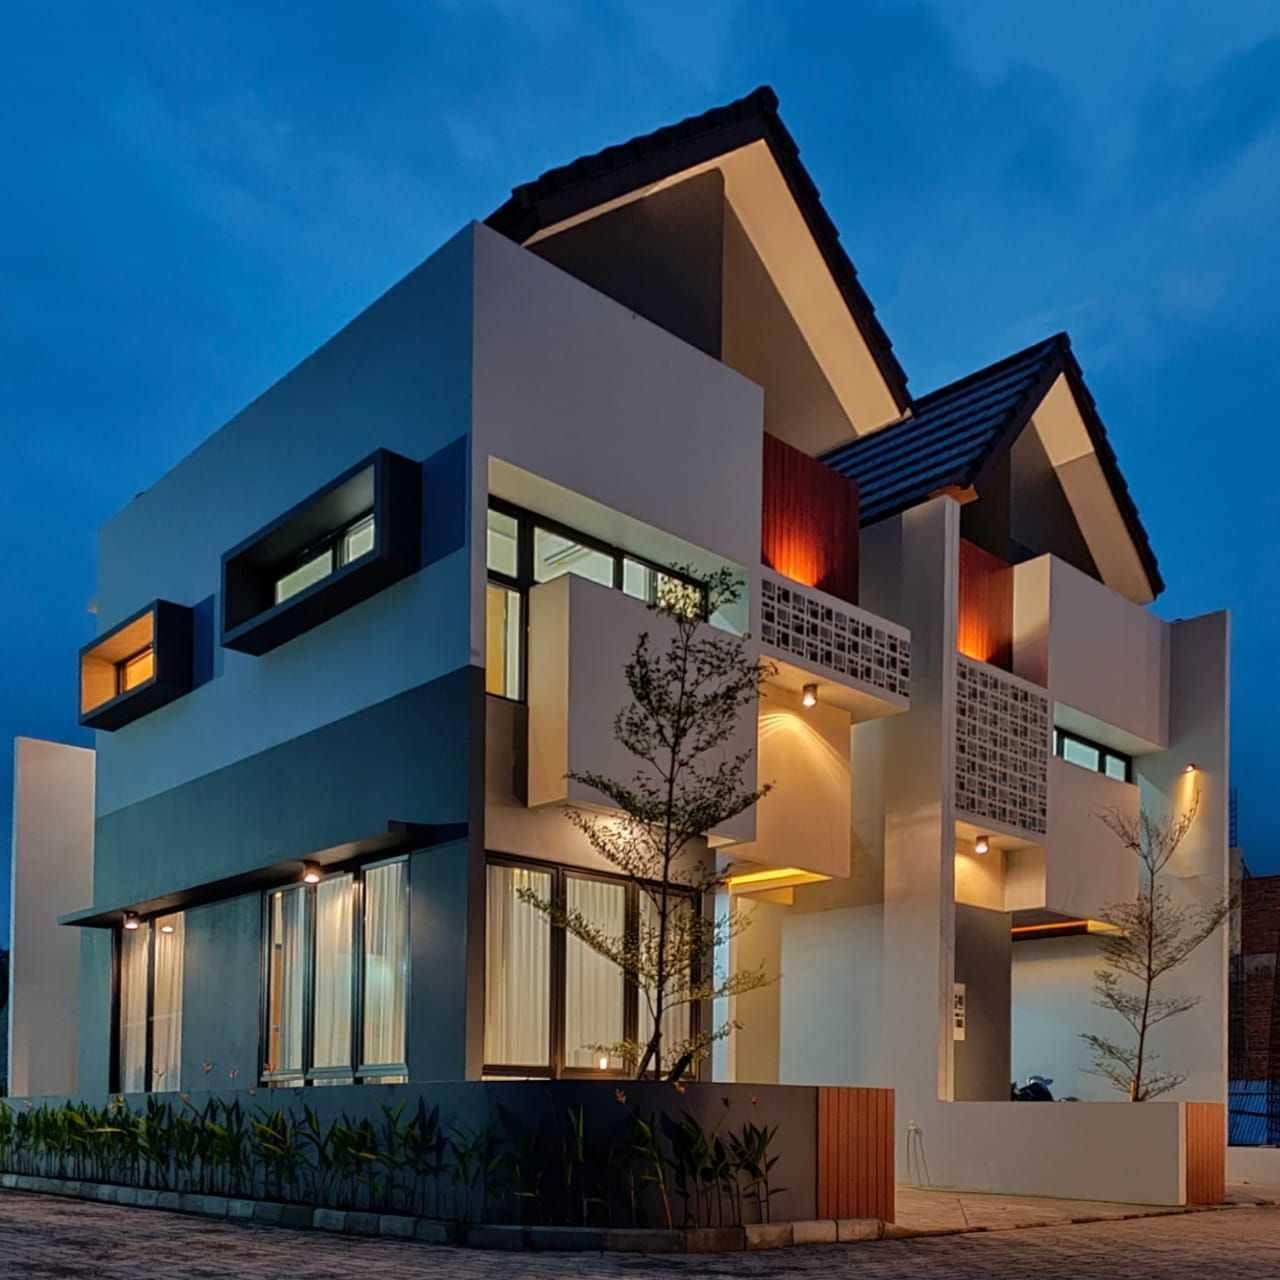 Arbatra Design Balboa Estate Bintaro Pd. Pucung, Kec. Pd. Aren, Kota Tangerang Selatan, Banten 15229, Indonesia Pd. Pucung, Kec. Pd. Aren, Kota Tangerang Selatan, Banten 15229, Indonesia Arbatra-Design-Balboa-Estate-Bintaro   121226